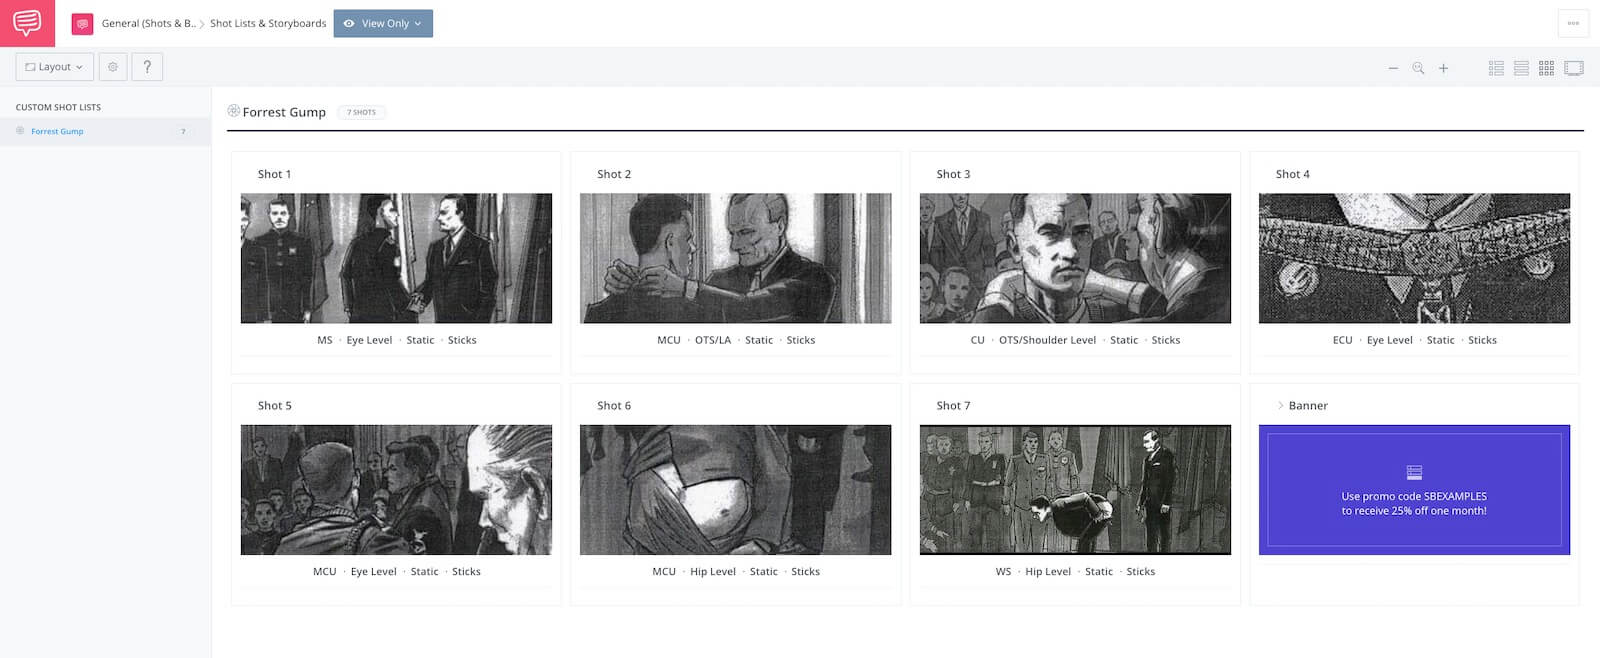 Storyboard Examples - Movie Storyboard - Forrest Gump Storyboard - StudioBinder